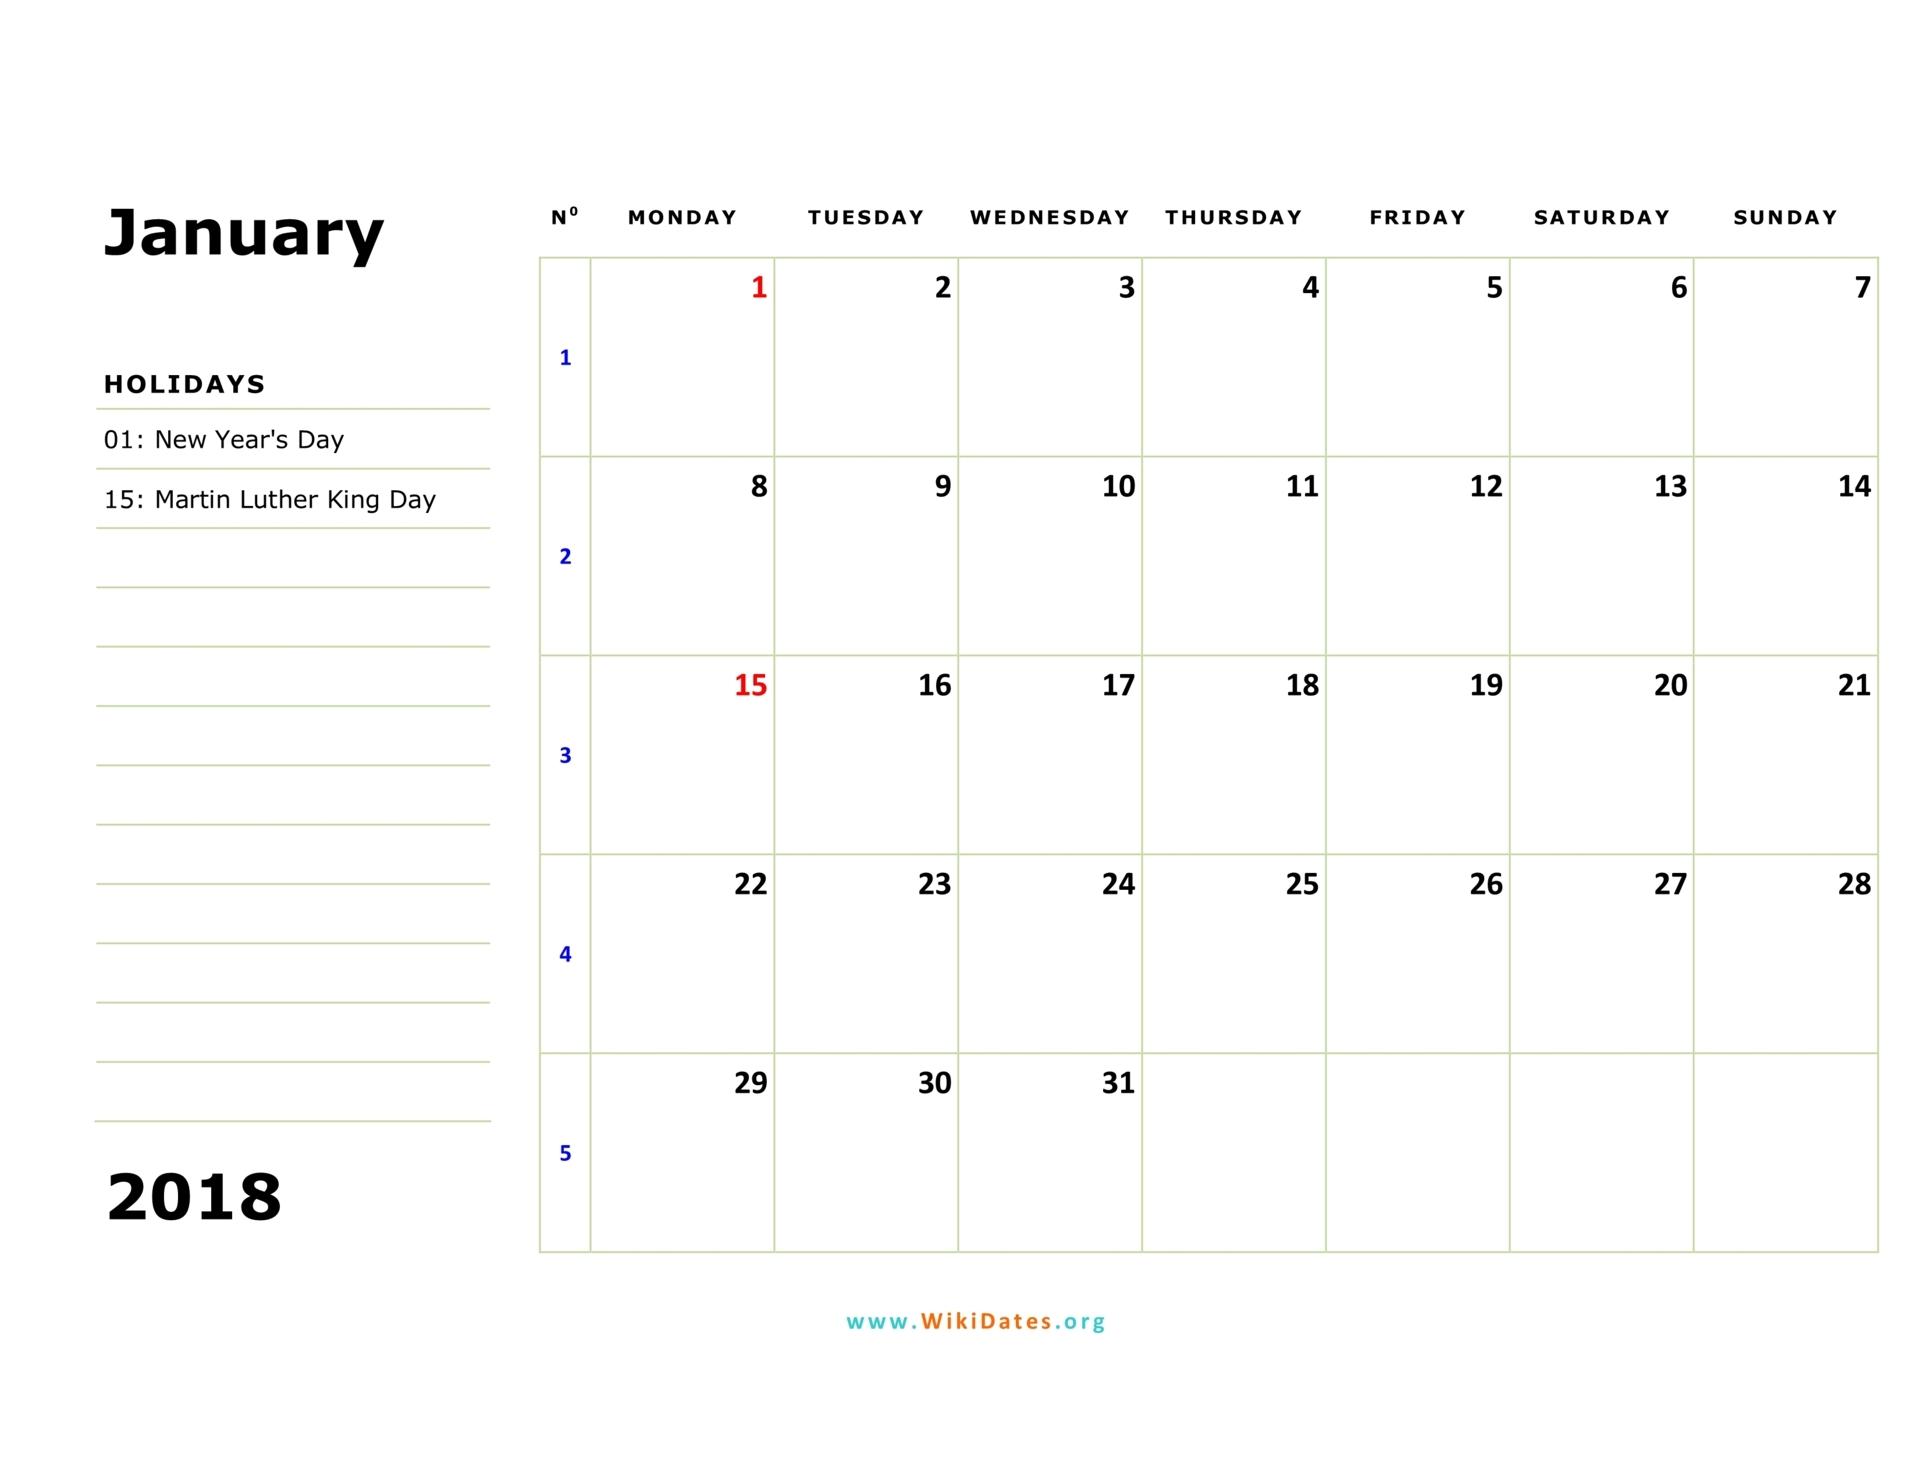 January 2018 Calendar | WikiDates.org